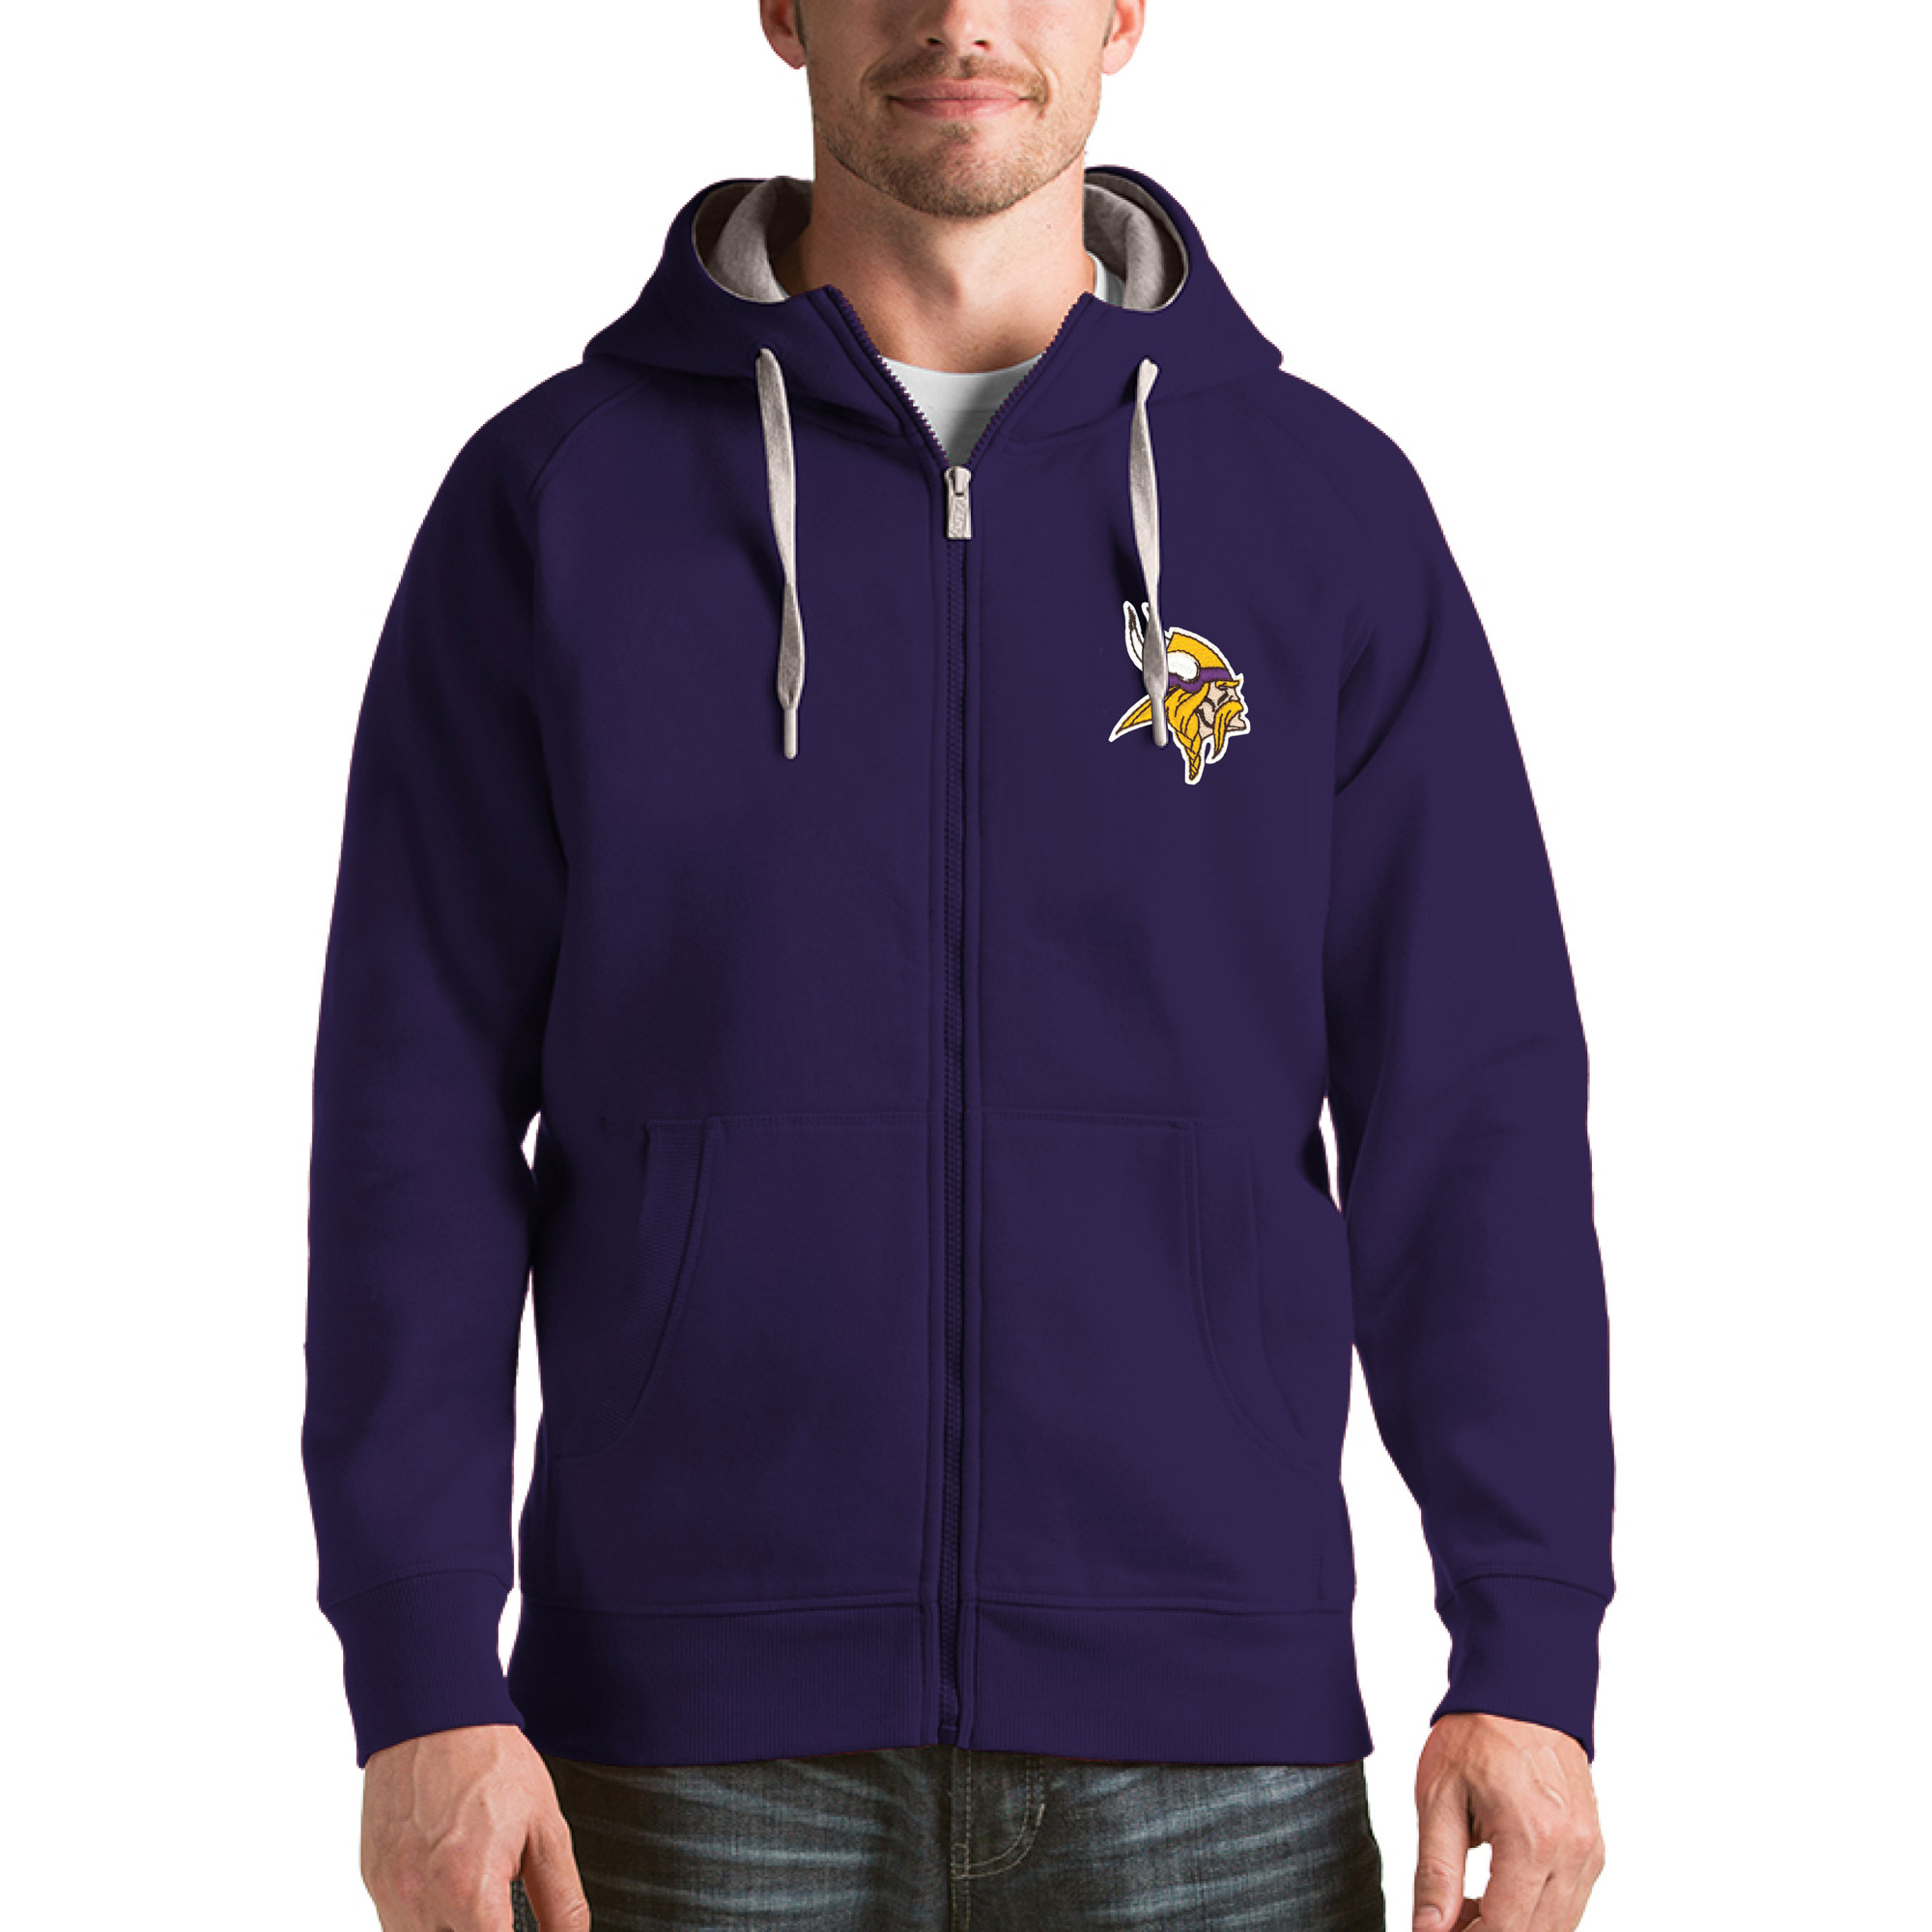 Minnesota Vikings Antigua Victory Full-Zip Hoodie - Purple